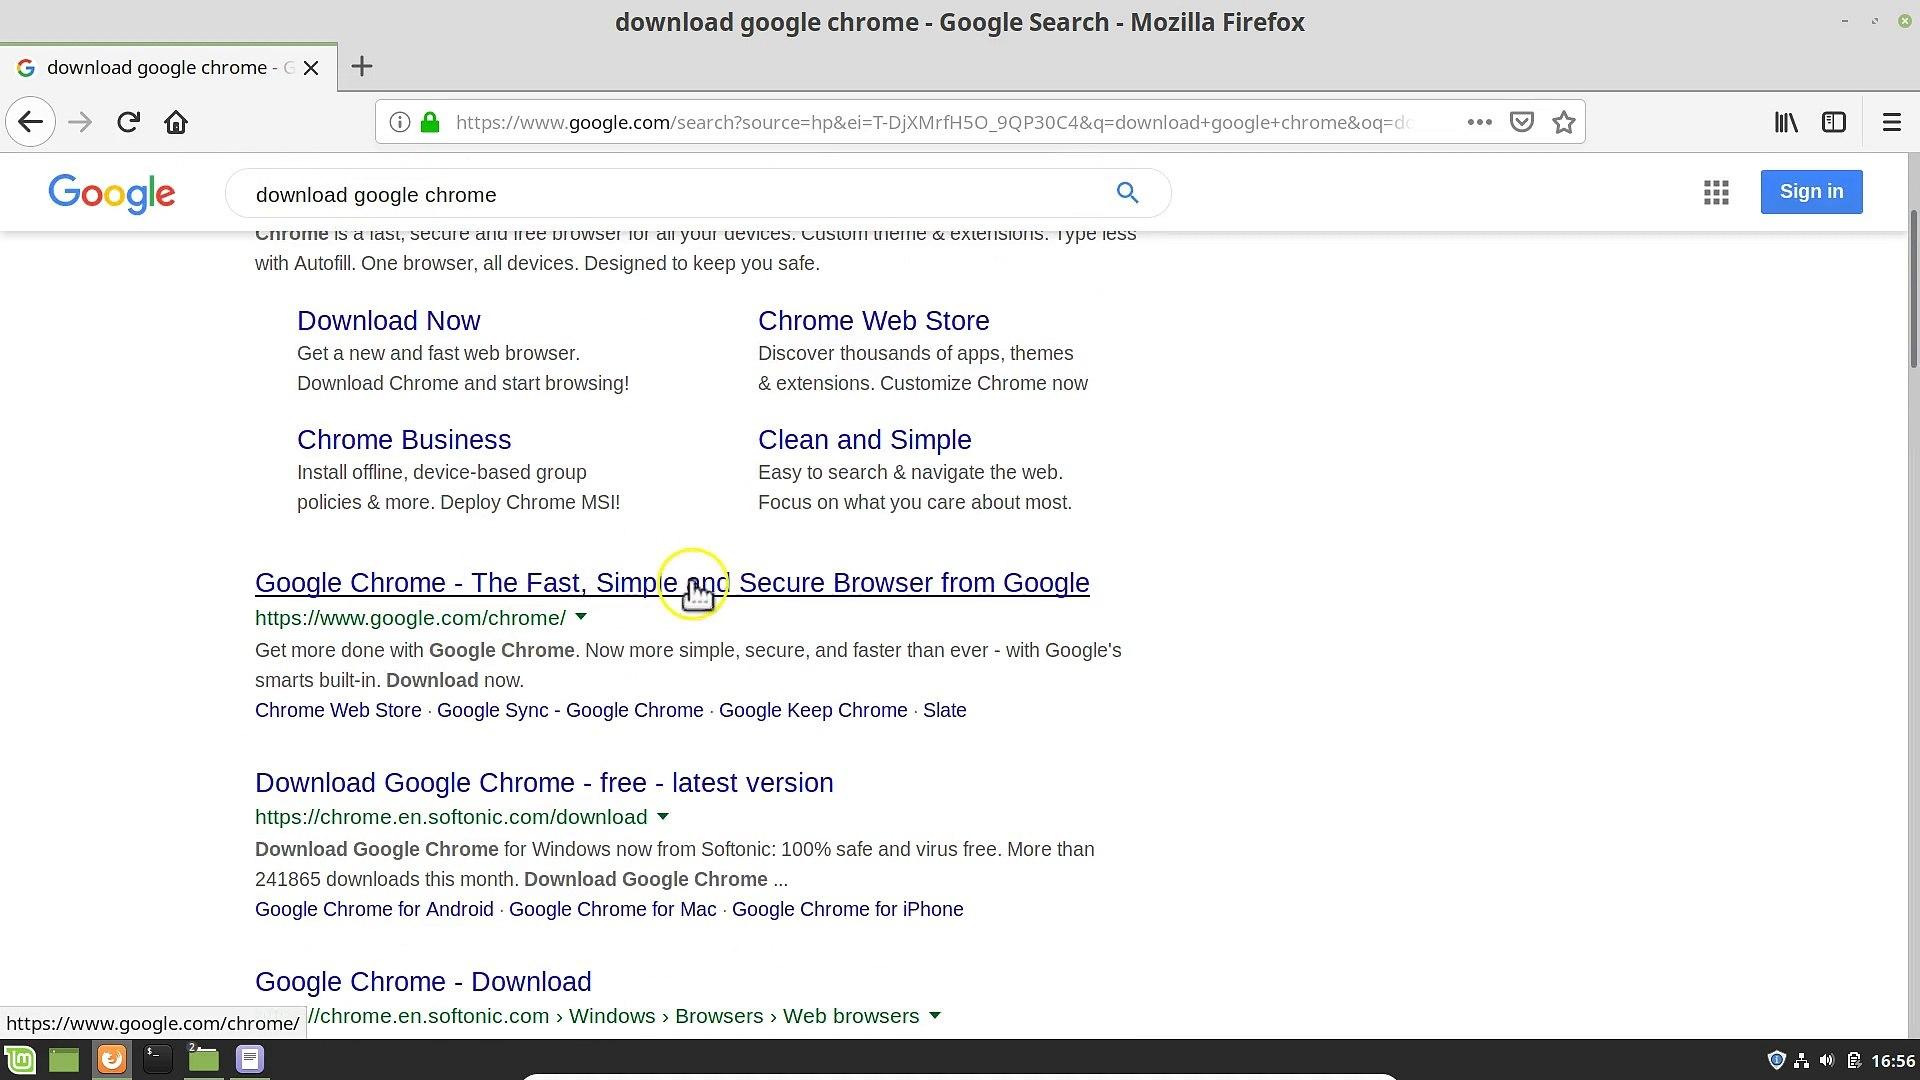 How to Install Google Chrome On Linux Mint 19 1 Cinnamon?